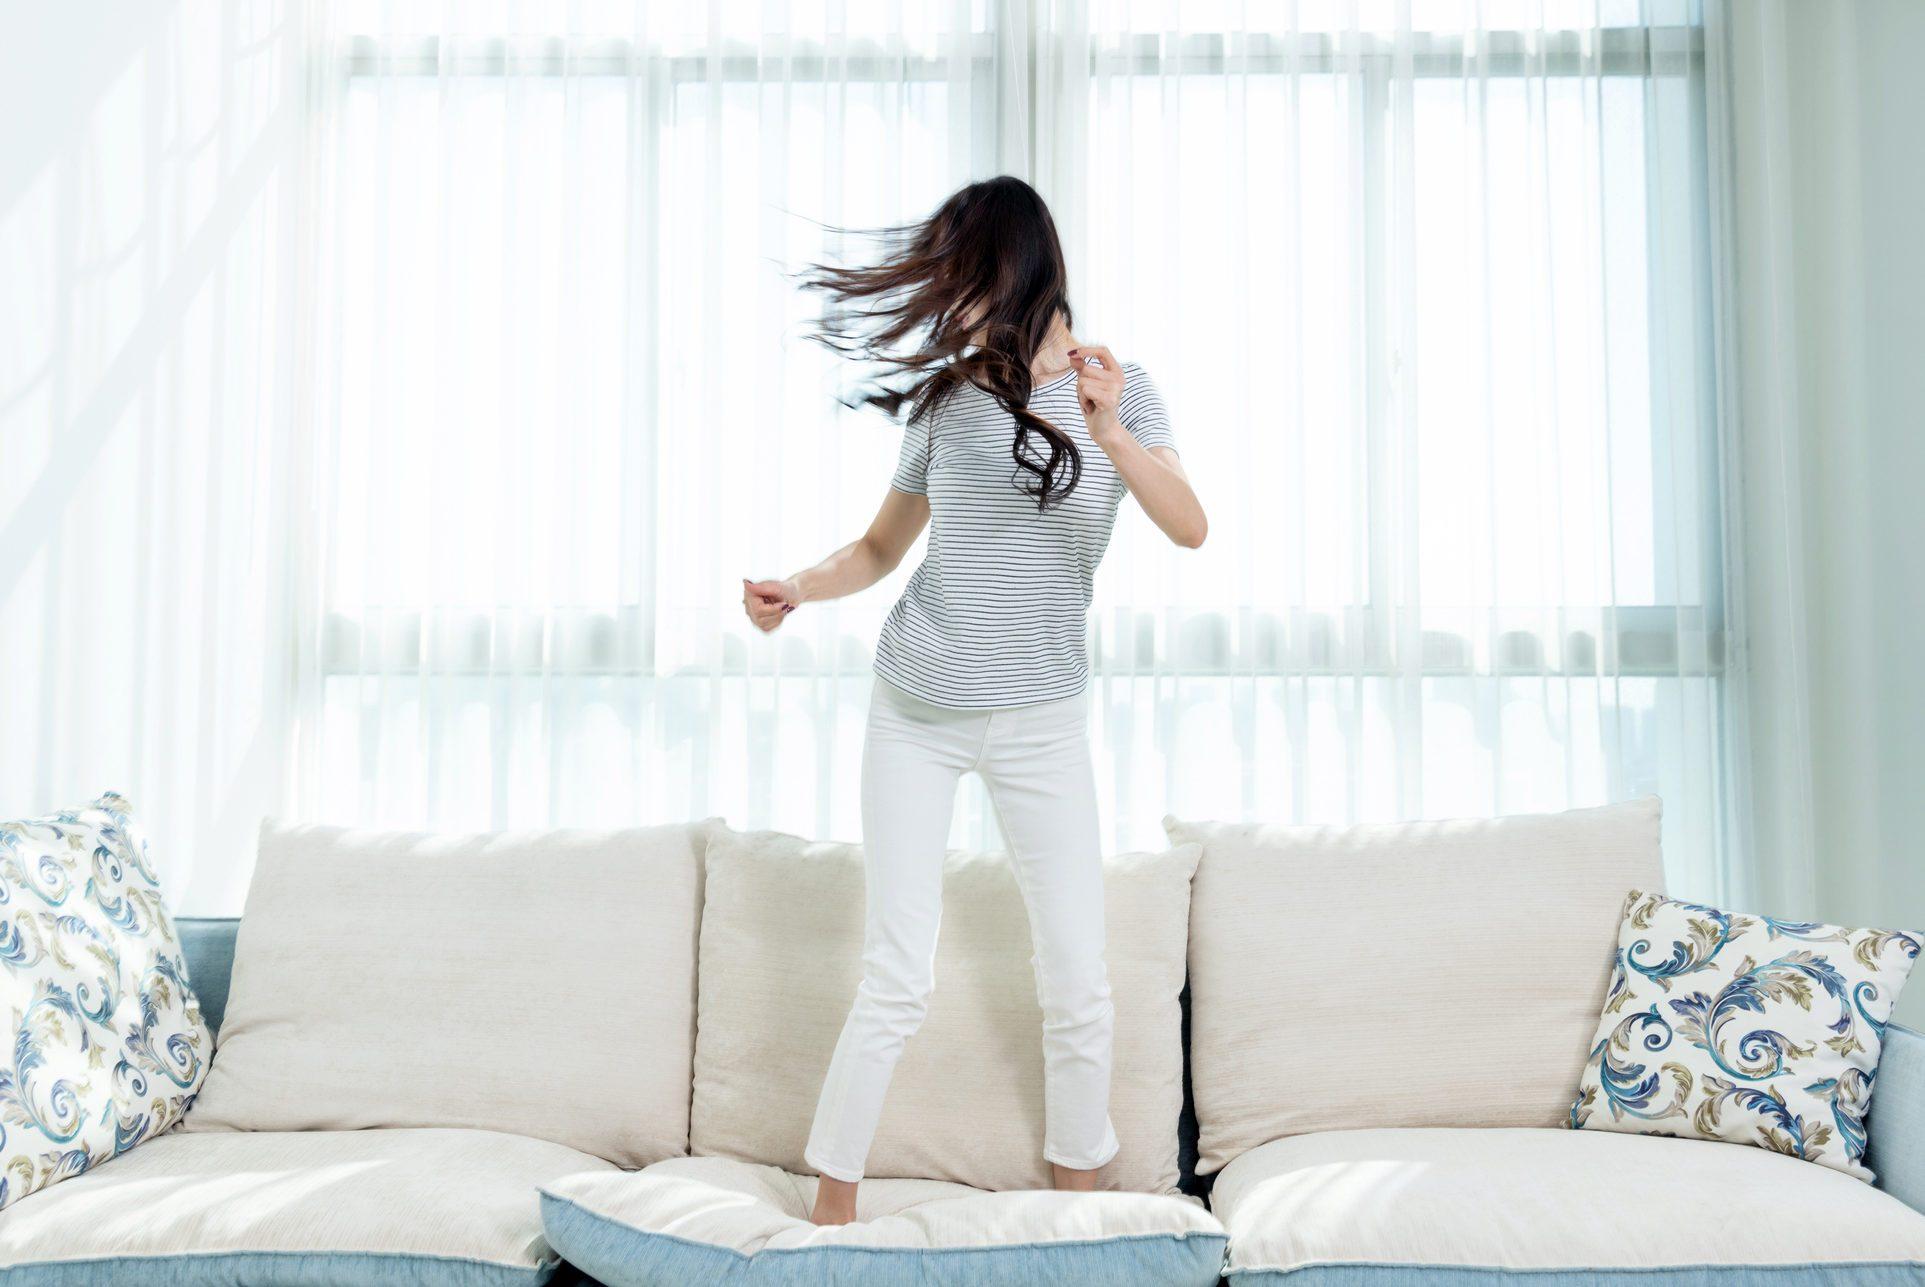 Woman dancing on the sofa